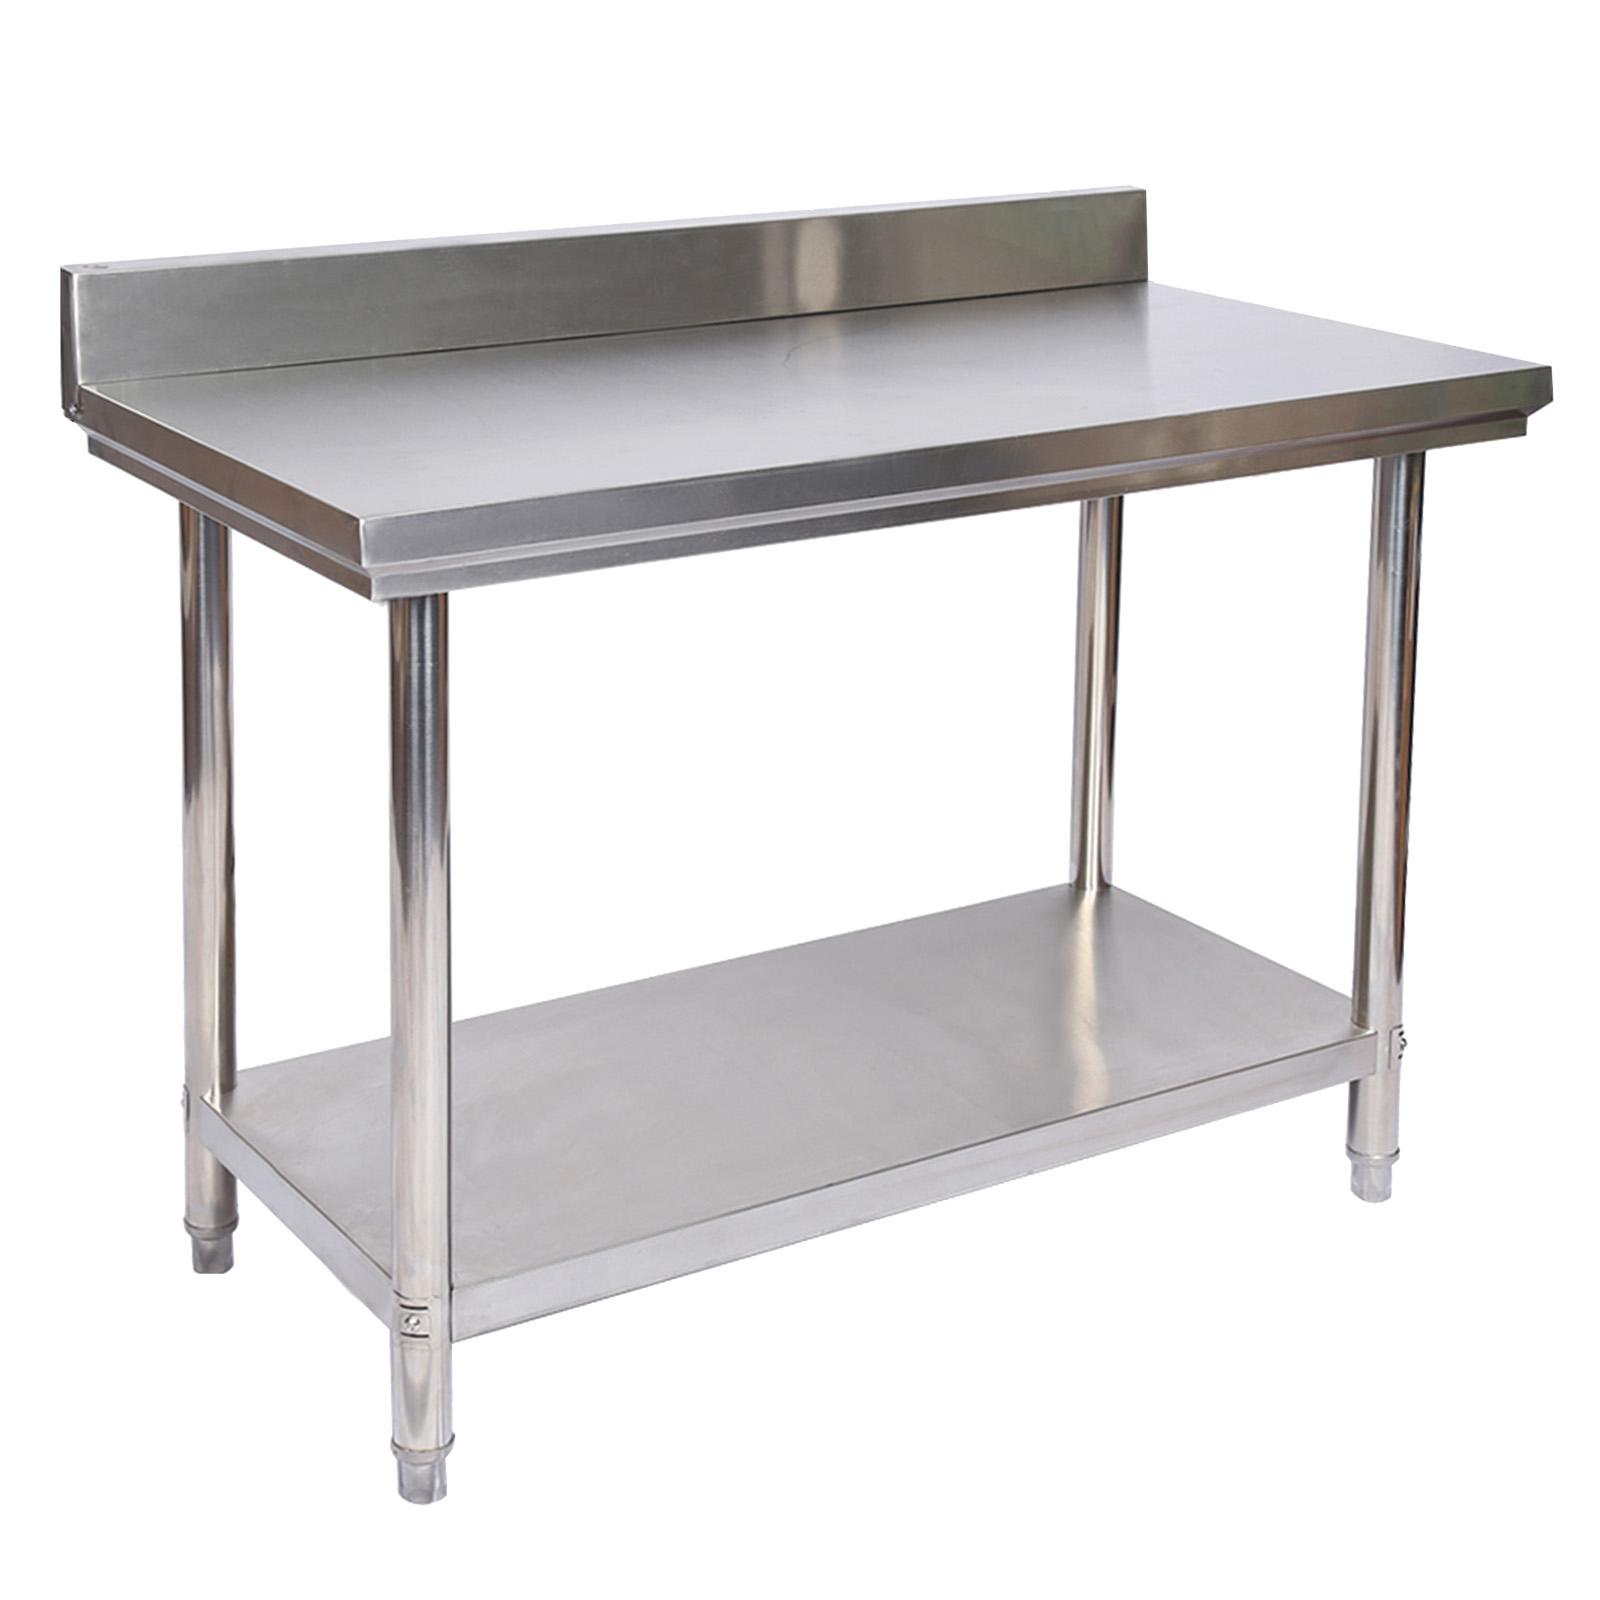 Table de travail Acier inoxydable avec rebord de protection 12 x ...